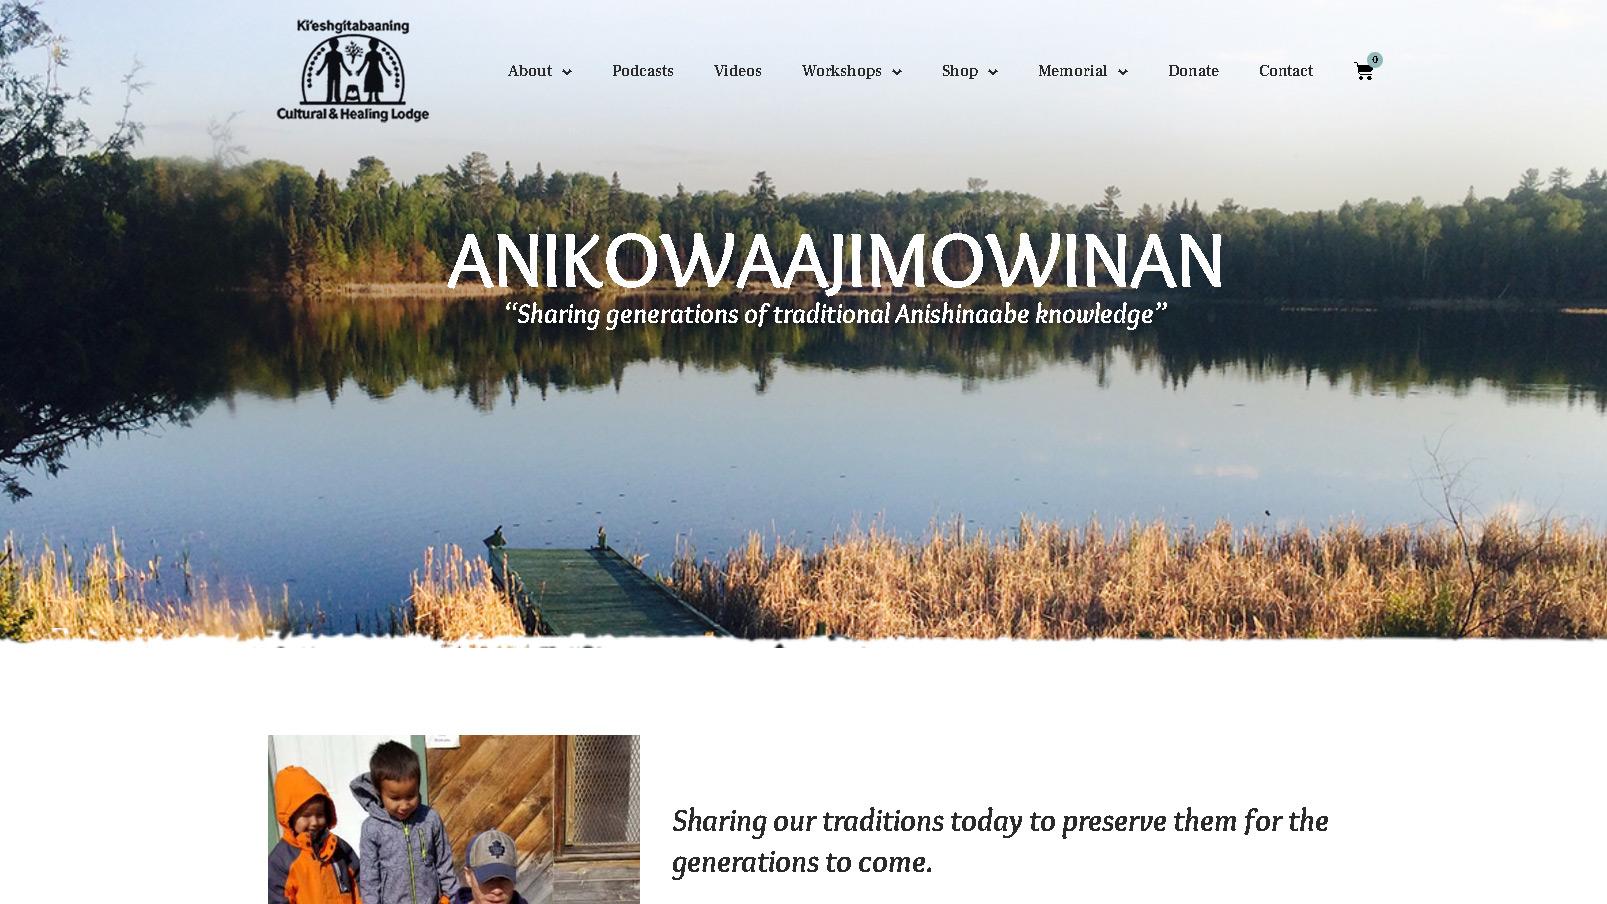 Anikowaajimowinan - Sharing generations of traditional Anishinaabe knowledge